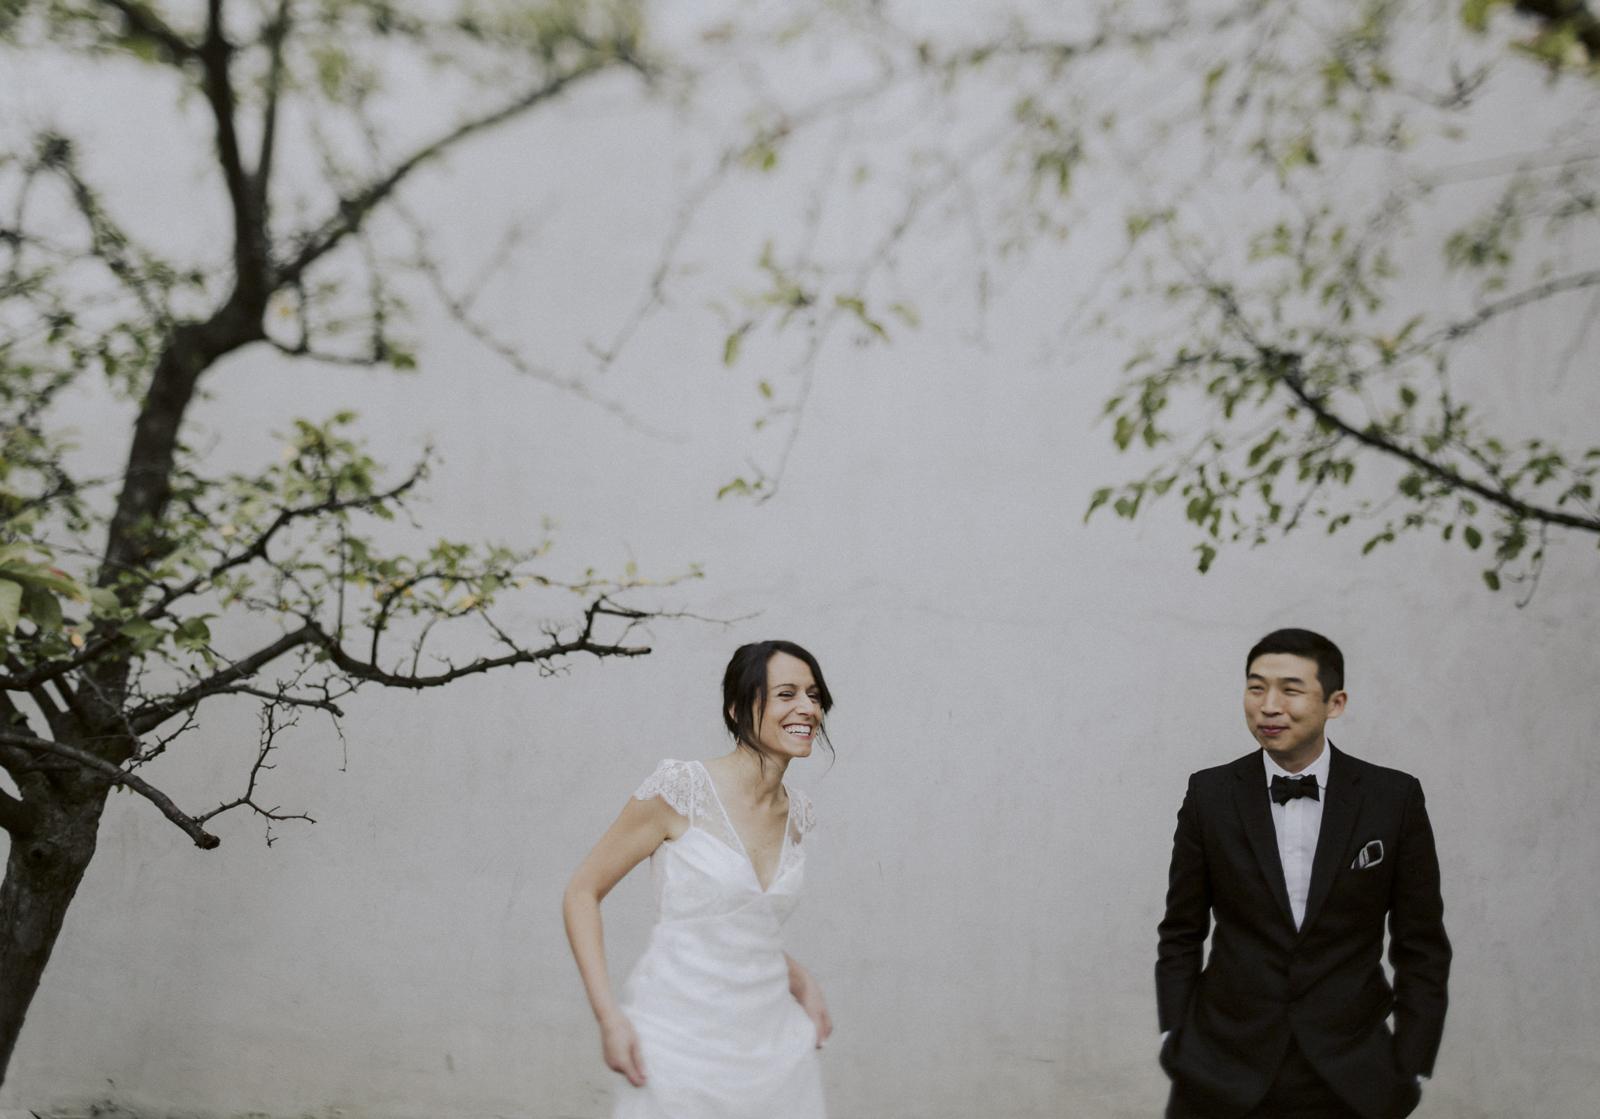 Jiwoo+Tara-Married-Blog-50.jpg